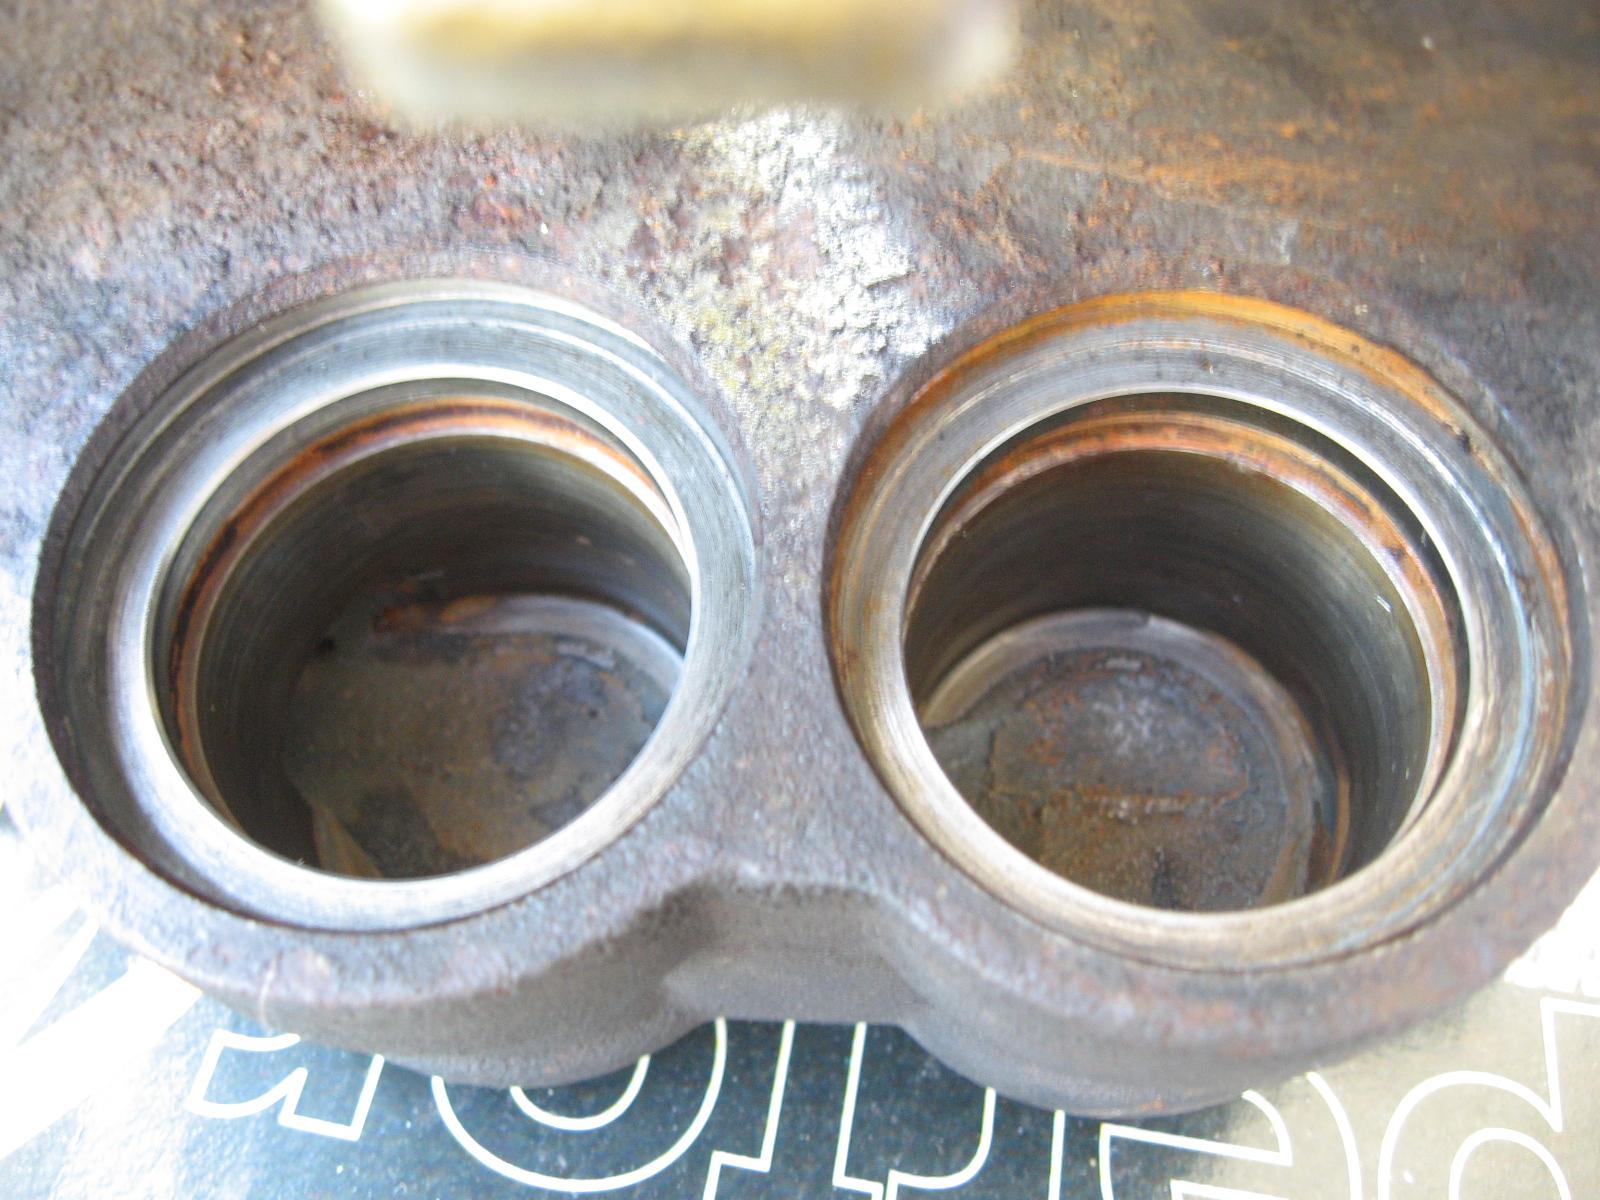 Me kimi spot twin pot brake caliper serviced with